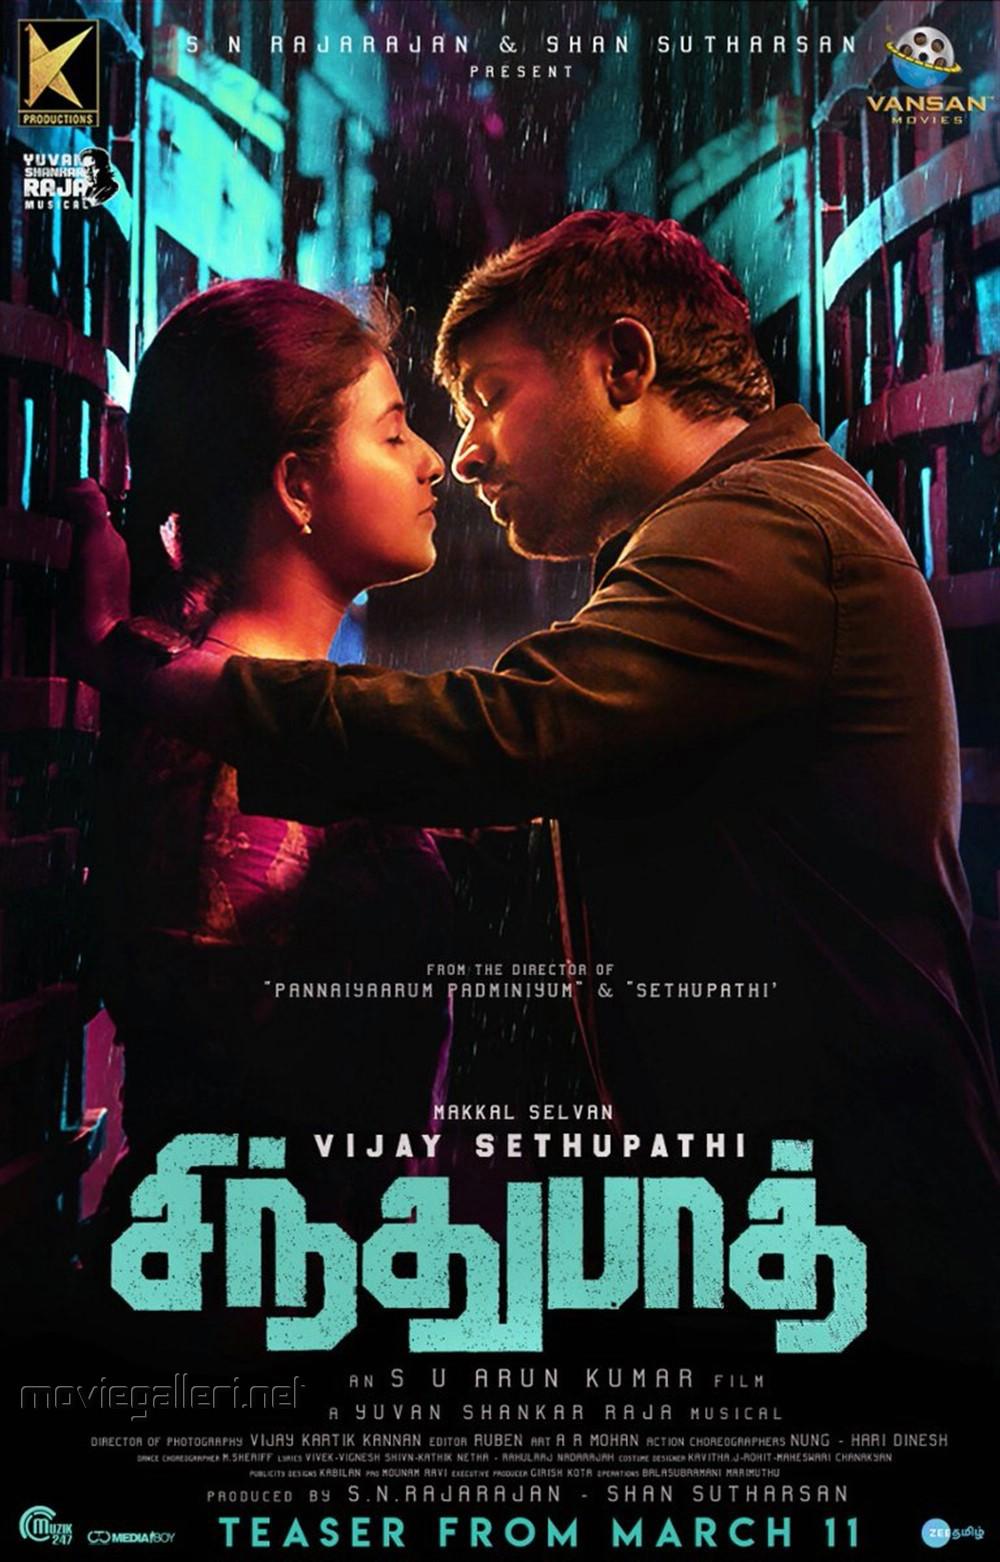 Anjali Vijay Sethupathi Sindhubaadh Movie Teaser on March 11th Posters HD